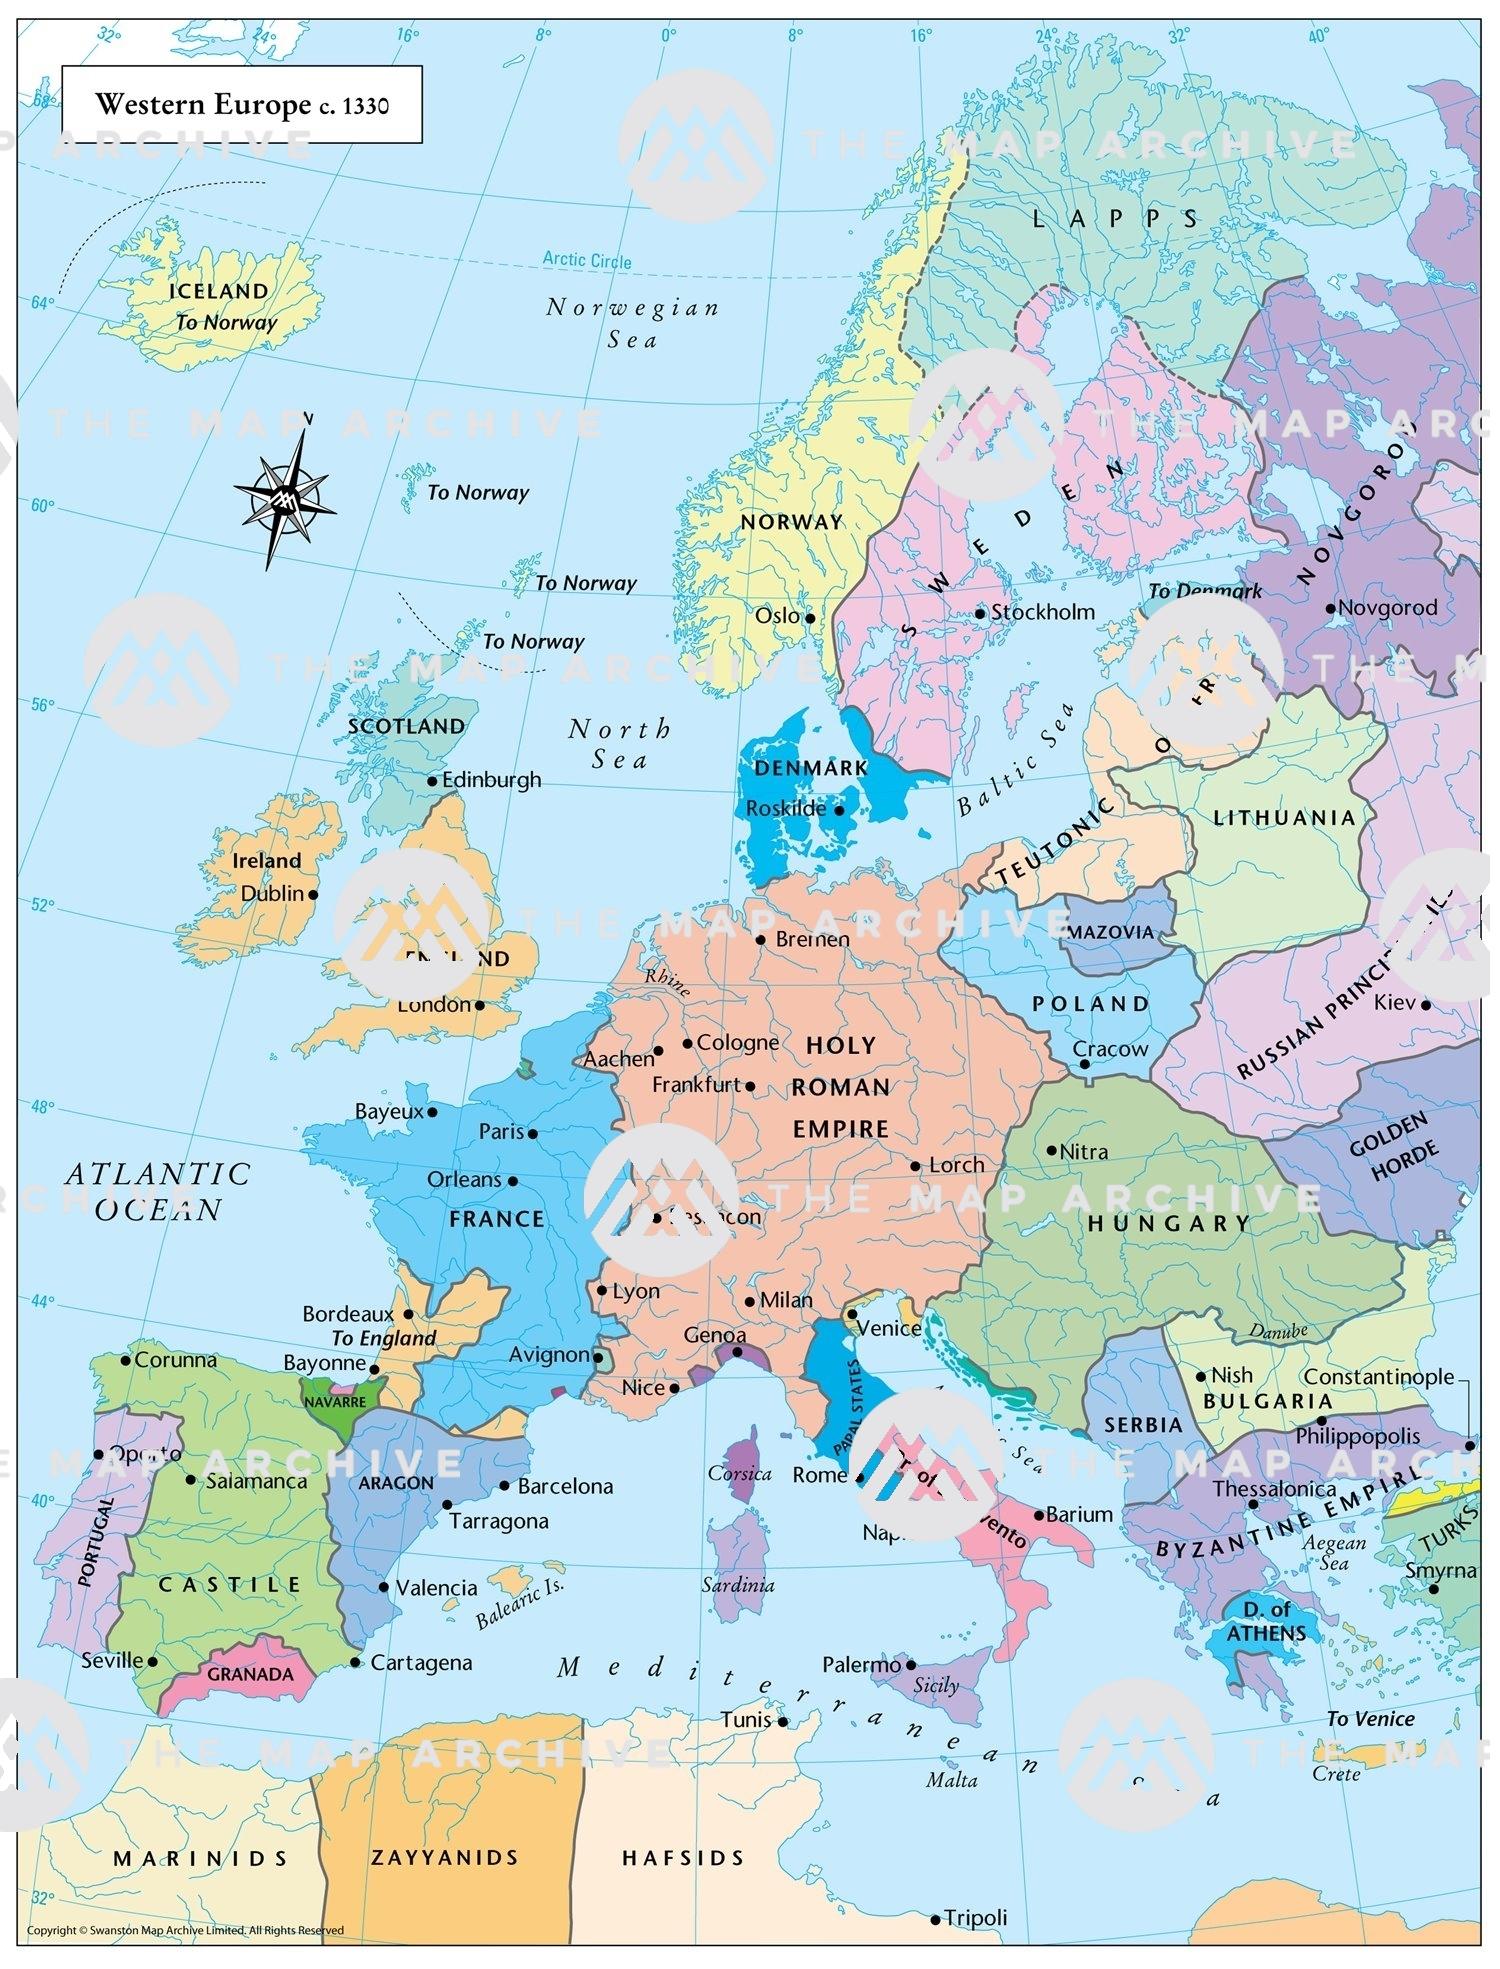 map of west europe Western Europe c. 1330